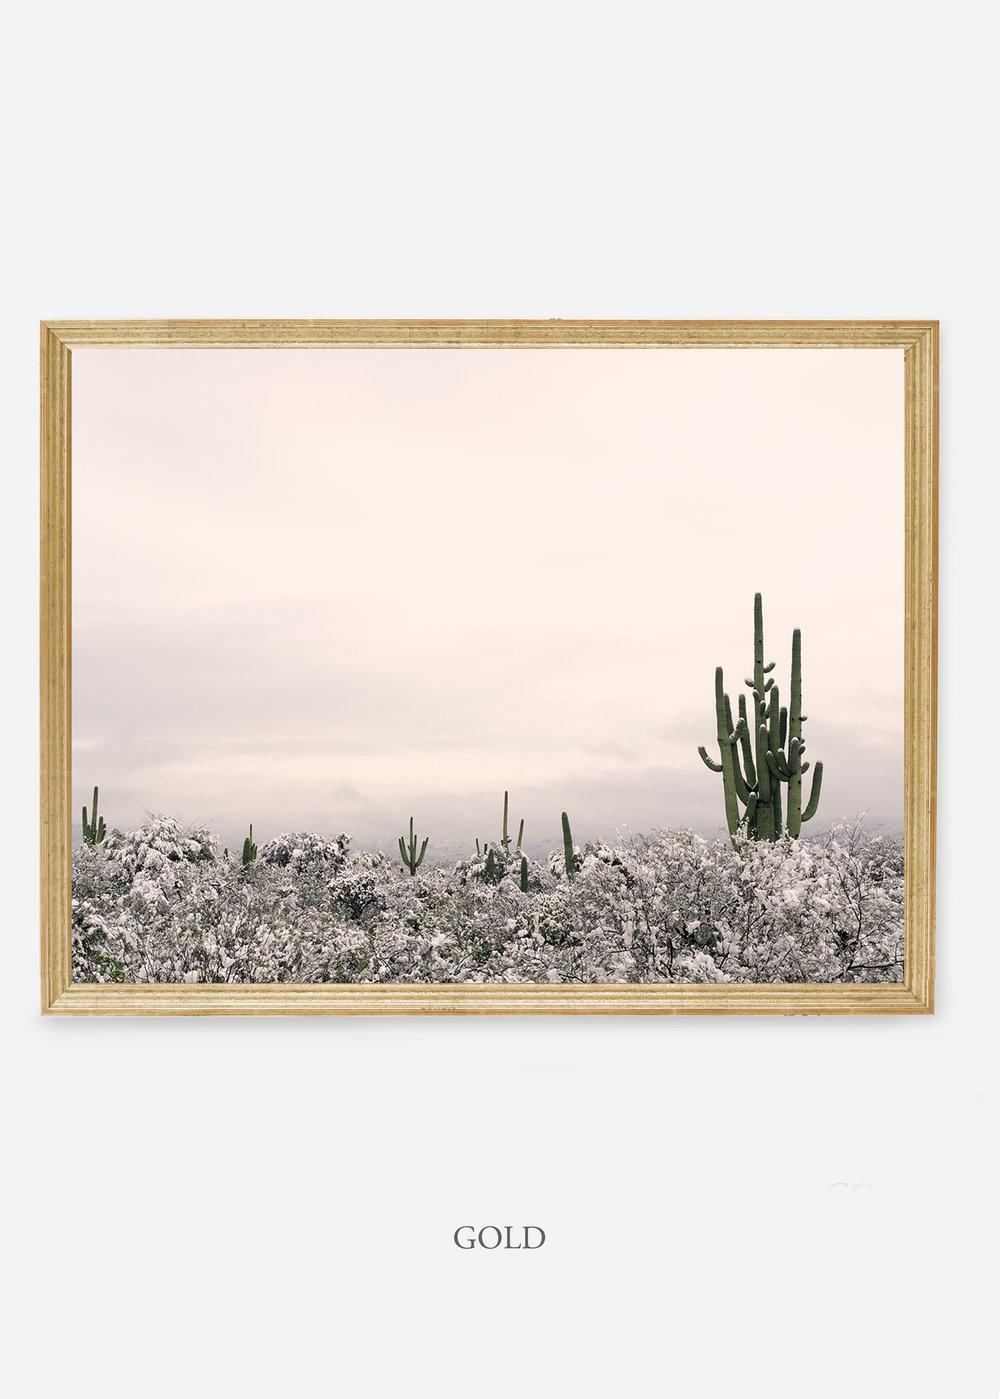 nomat-goldframe-saguaroNo.7-wildercalifornia-art-wallart-cactusprint-homedecor-prints-arizona-botanical-artwork-interiordesign.jpg